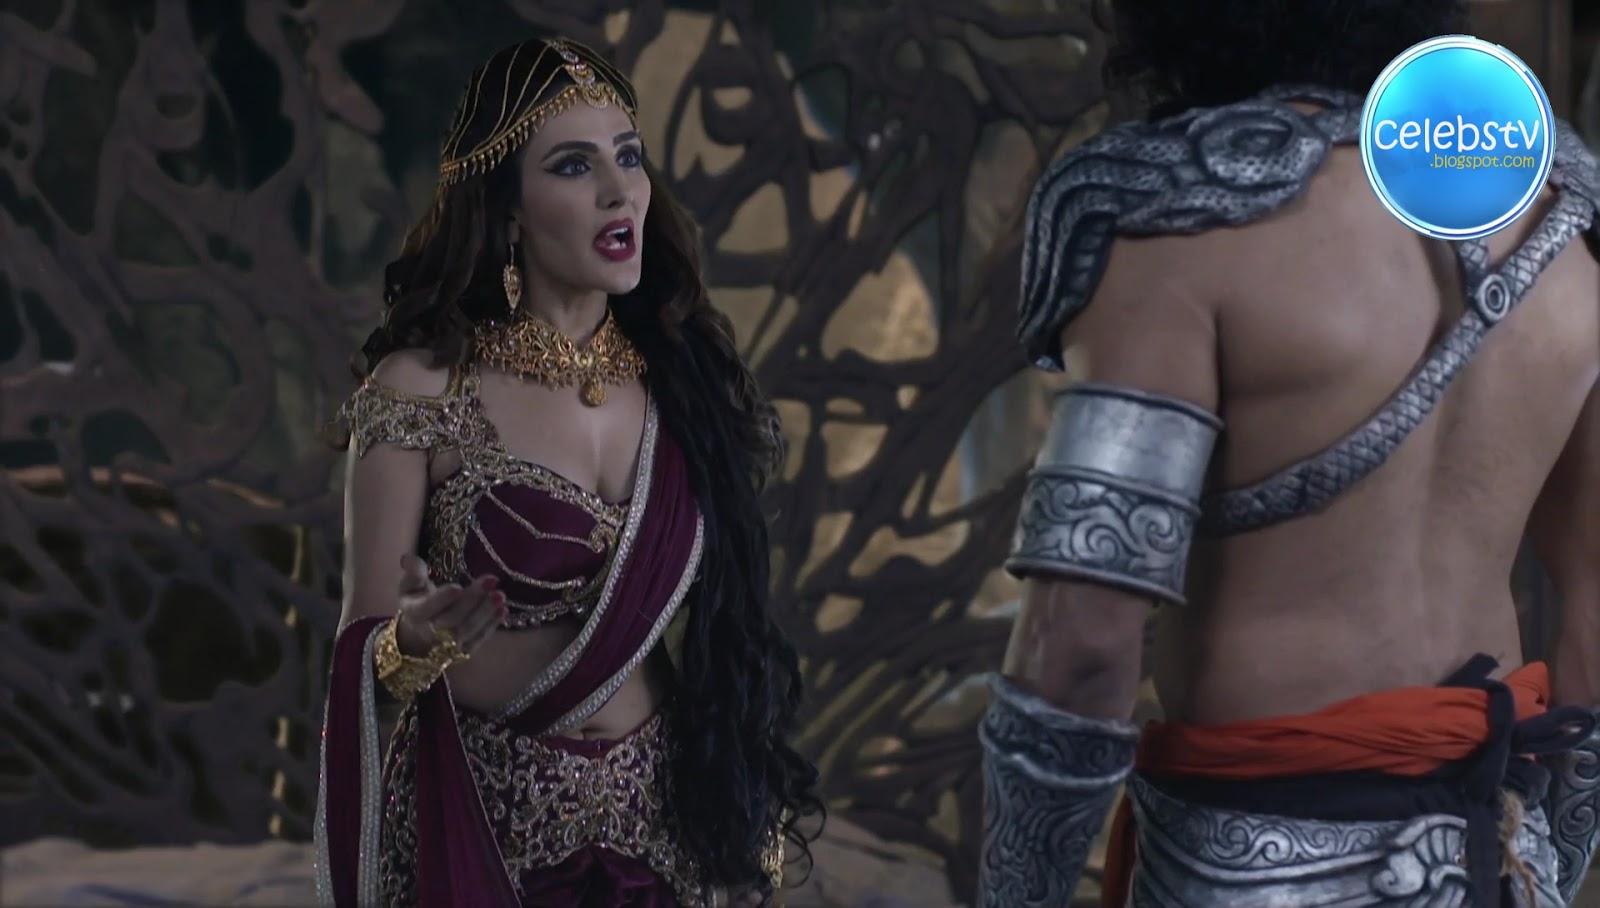 Sudeepa Singh Aka Rani Pari Very Hot Sexy Deep Cleavage -1282